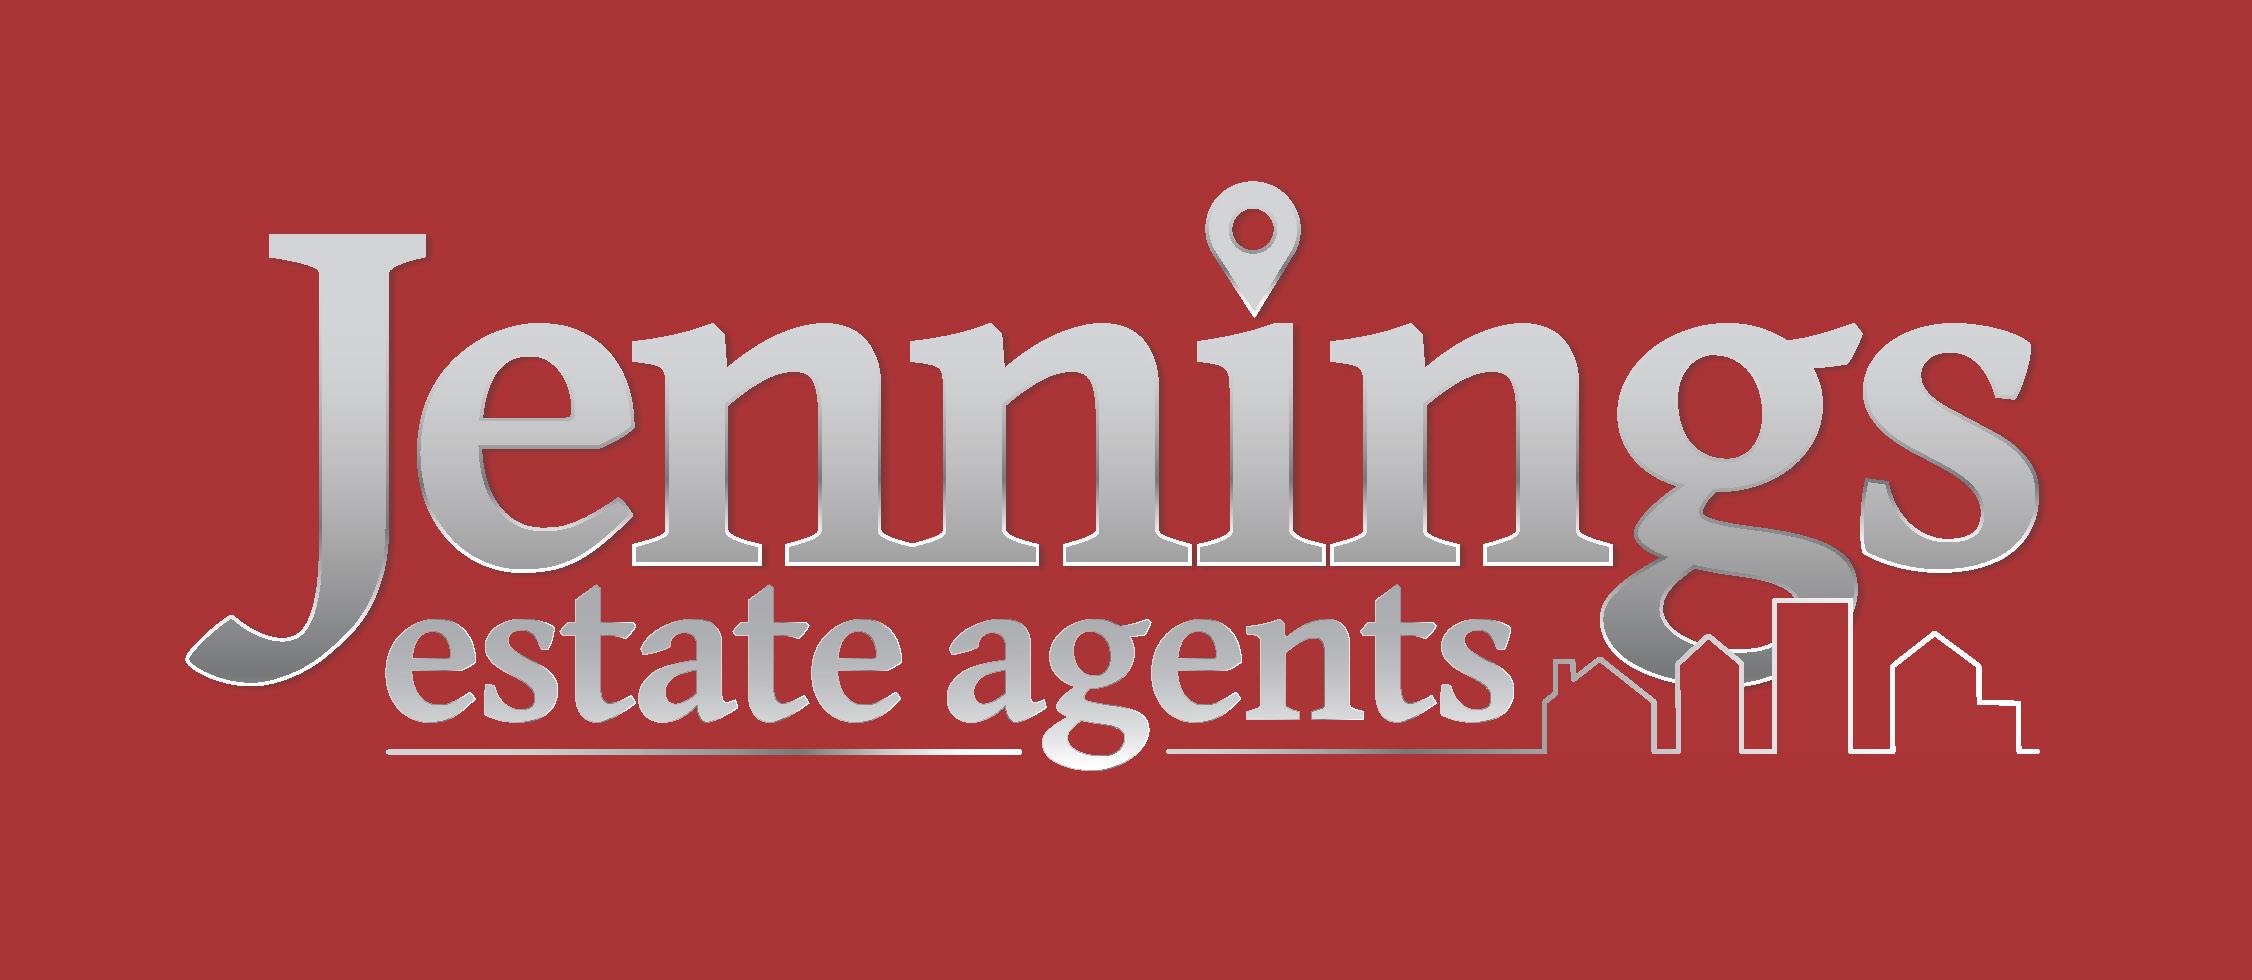 Jennings Estate Agents